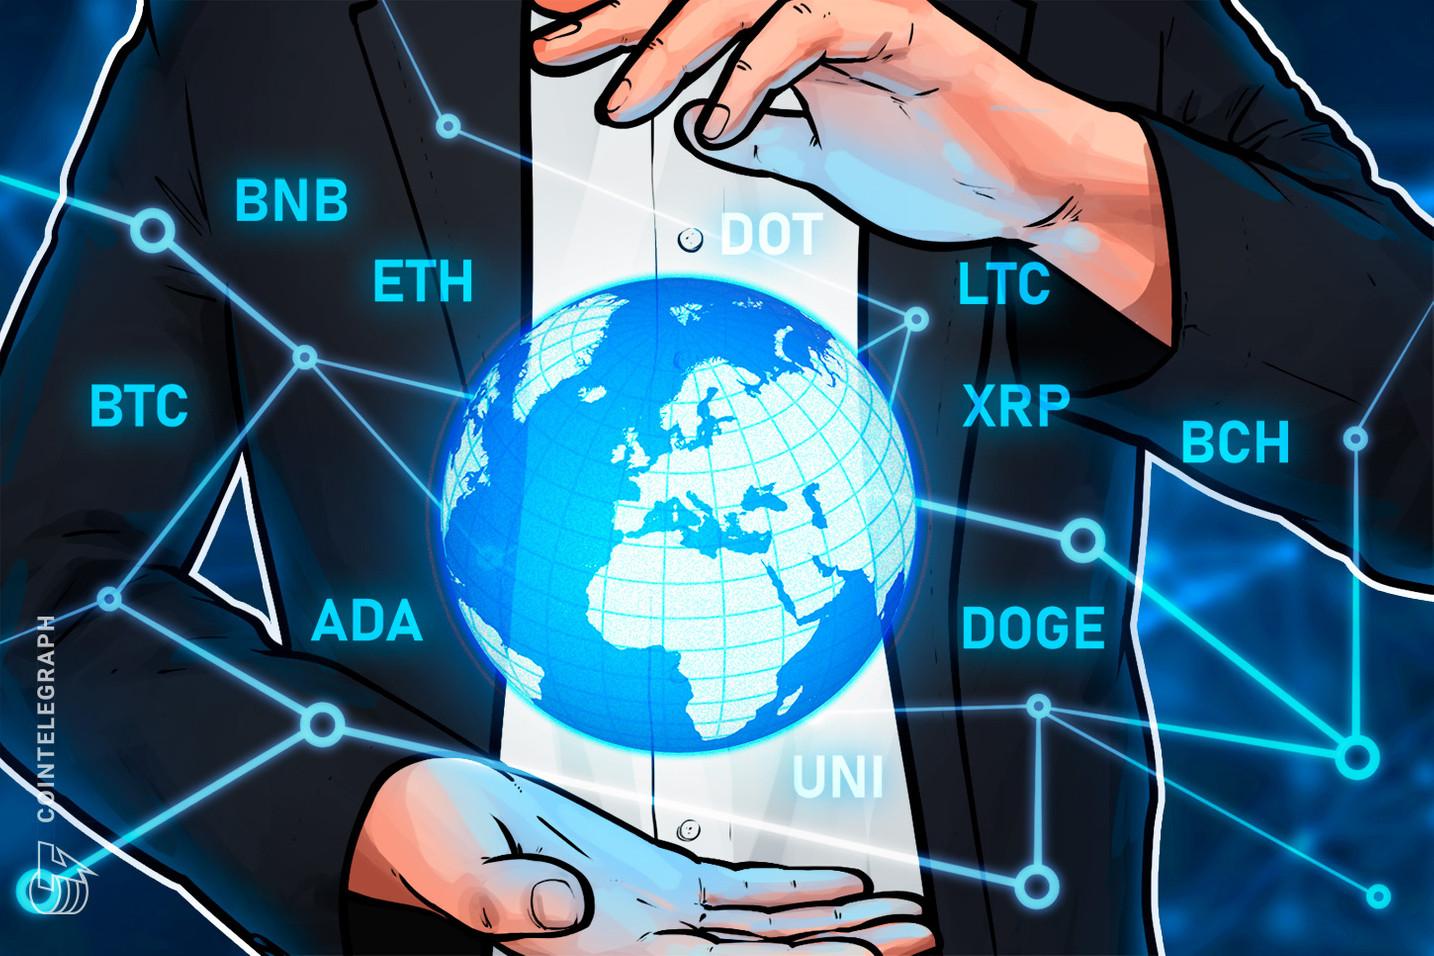 Cenu analīze 7/19: BTC, ETH, BNB, ADA, XRP, DOGE, DOT, UNI, BCH, LTC